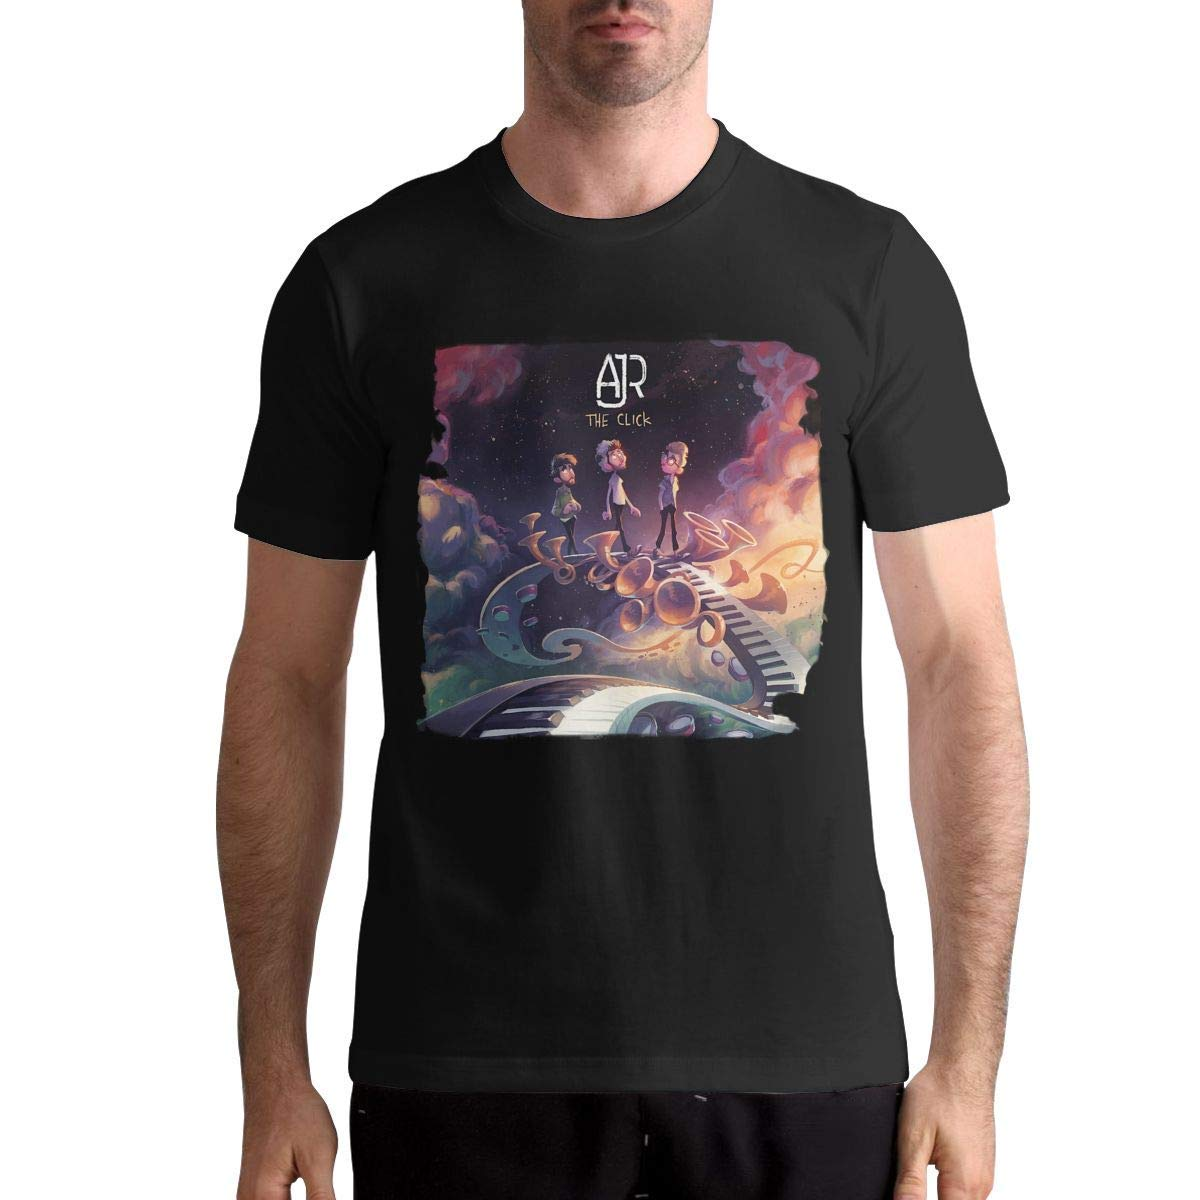 Ajrthe Click S Fashion Short Sleeve Music Band Tshirts Black